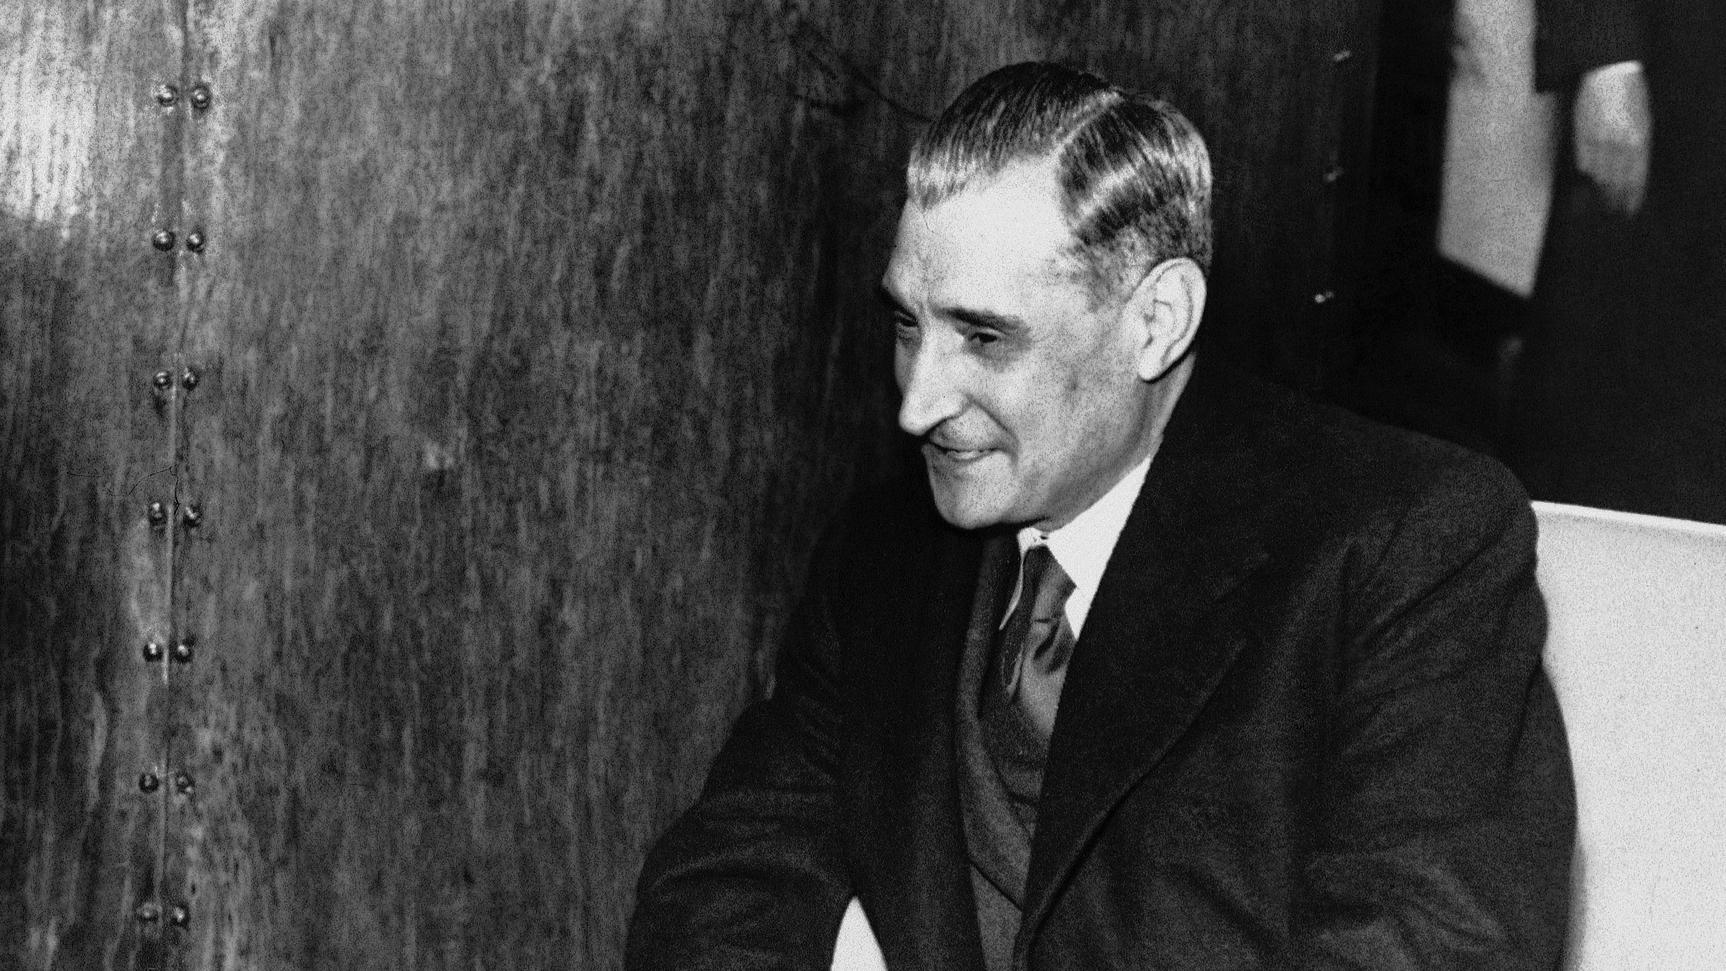 Portugal's dictator António de Oliveira Salazar